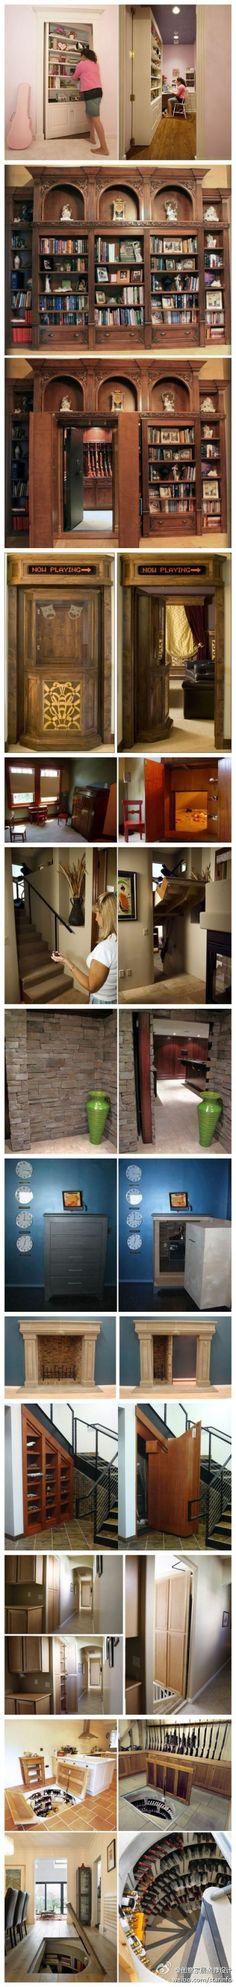 trendy Ideas for secret door design future house Hidden Spaces, Hidden Rooms, Hidden House, Future House, My House, Door Design, House Design, Entrance Design, Casa Loft